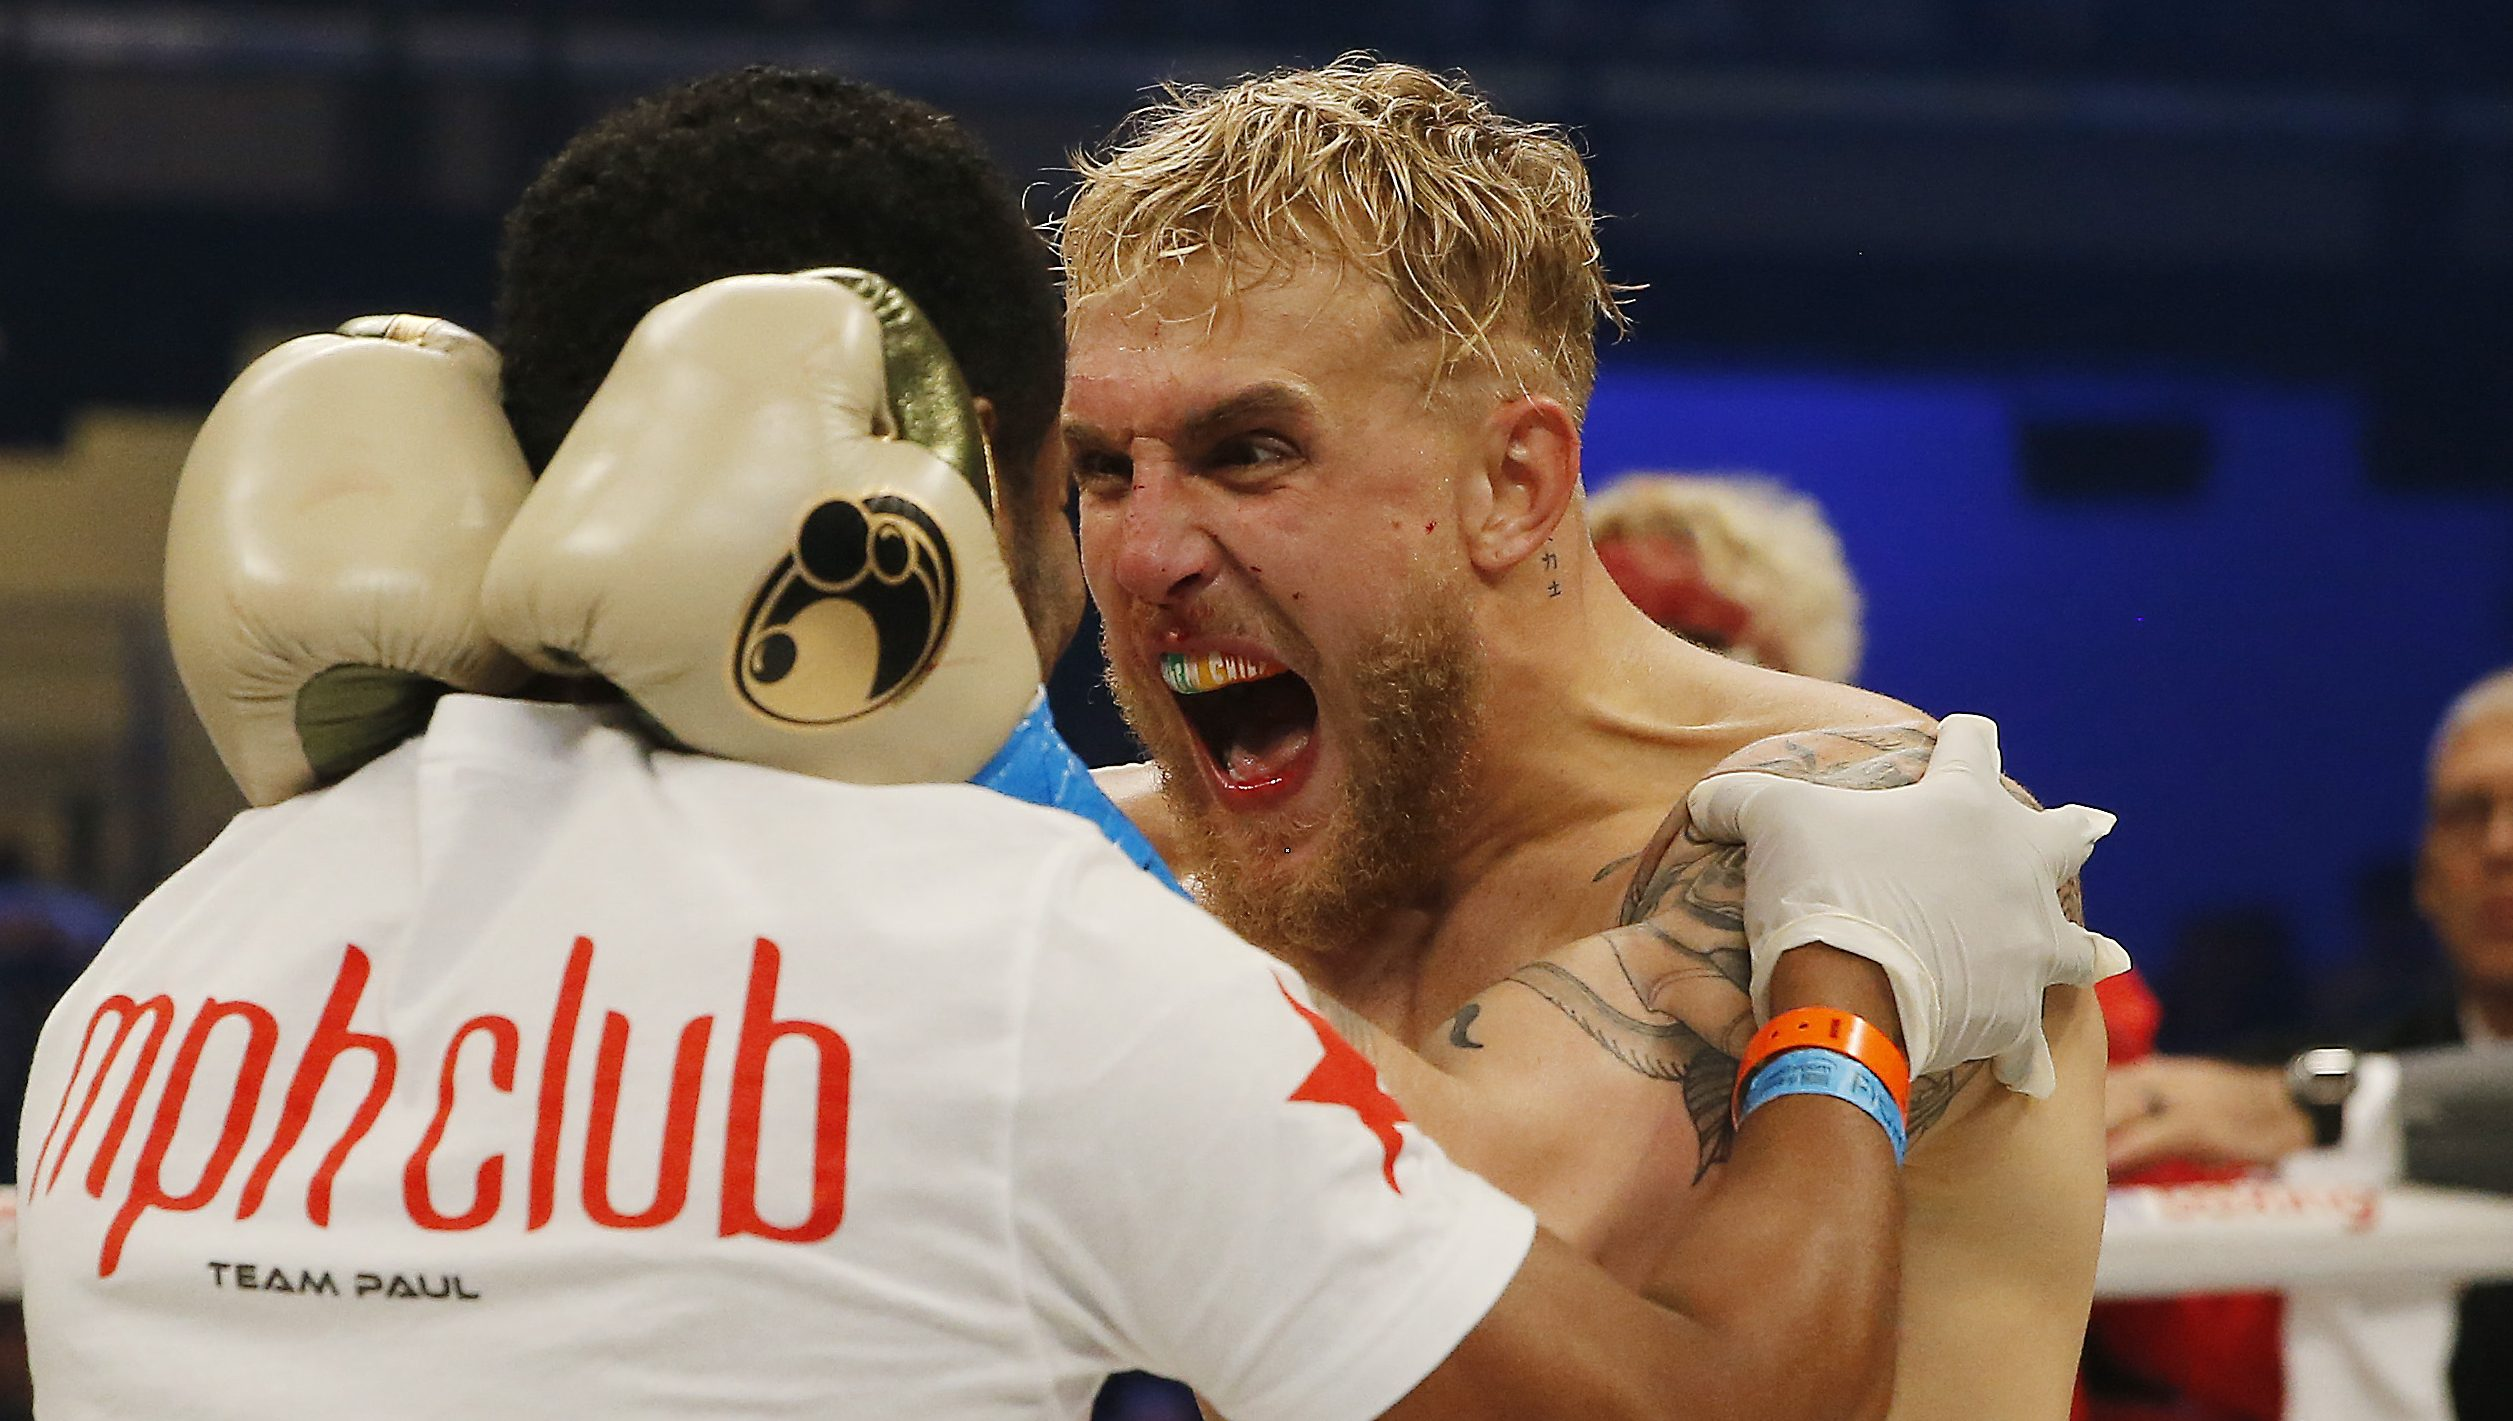 Jake Paul to Fight UFC Fighter on April 17: 'Rude Awakening'